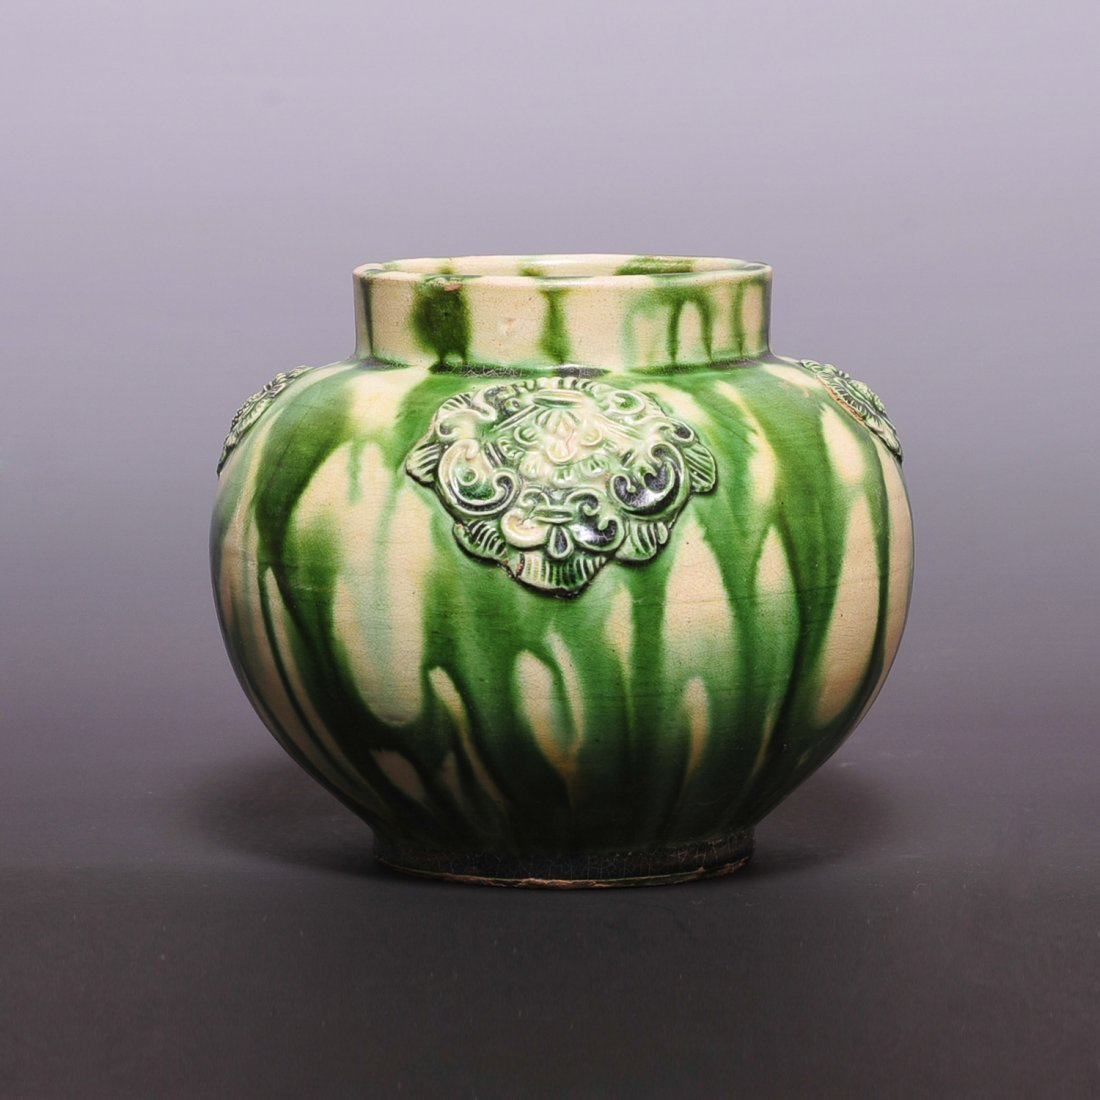 Tang Dynasty, A celadon glazed relief-deco jar